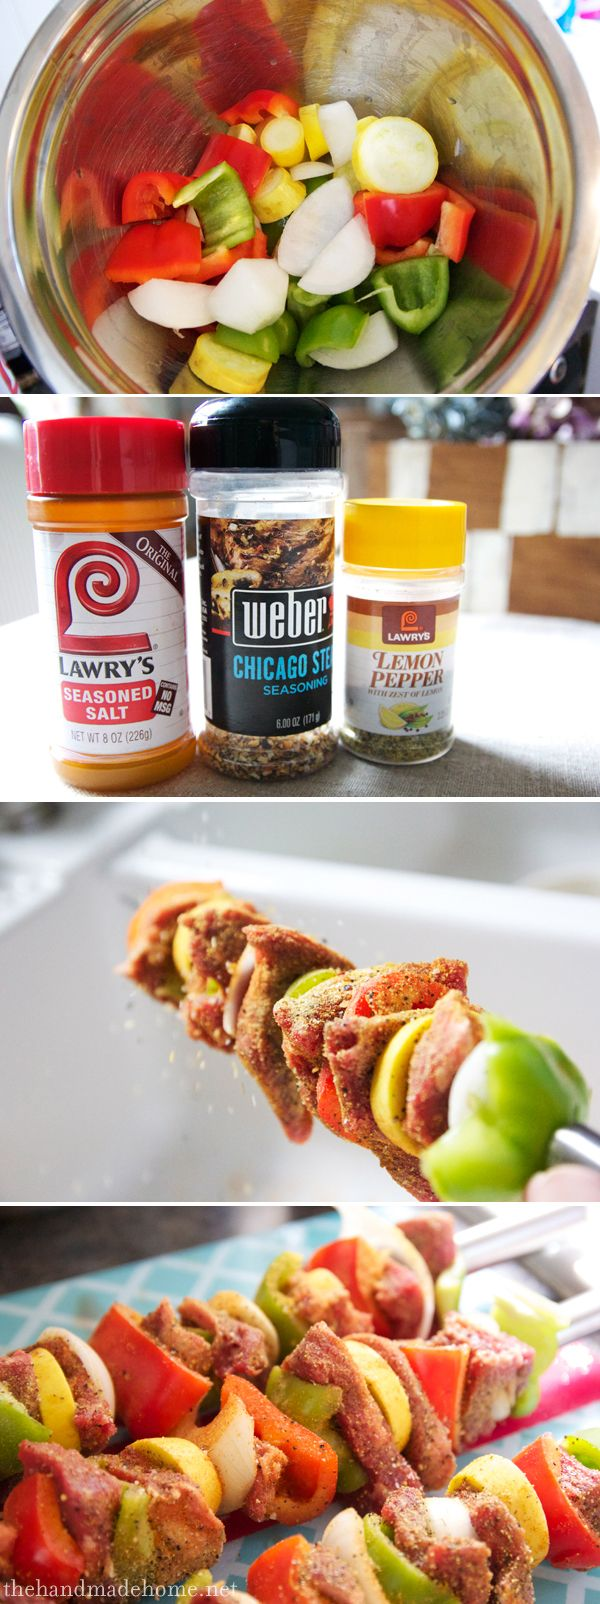 shishkabobs with Lawry's Seasoned Salt, Weber's Chicago Steak Seasoning, + Lawry's Lemon Pepper.